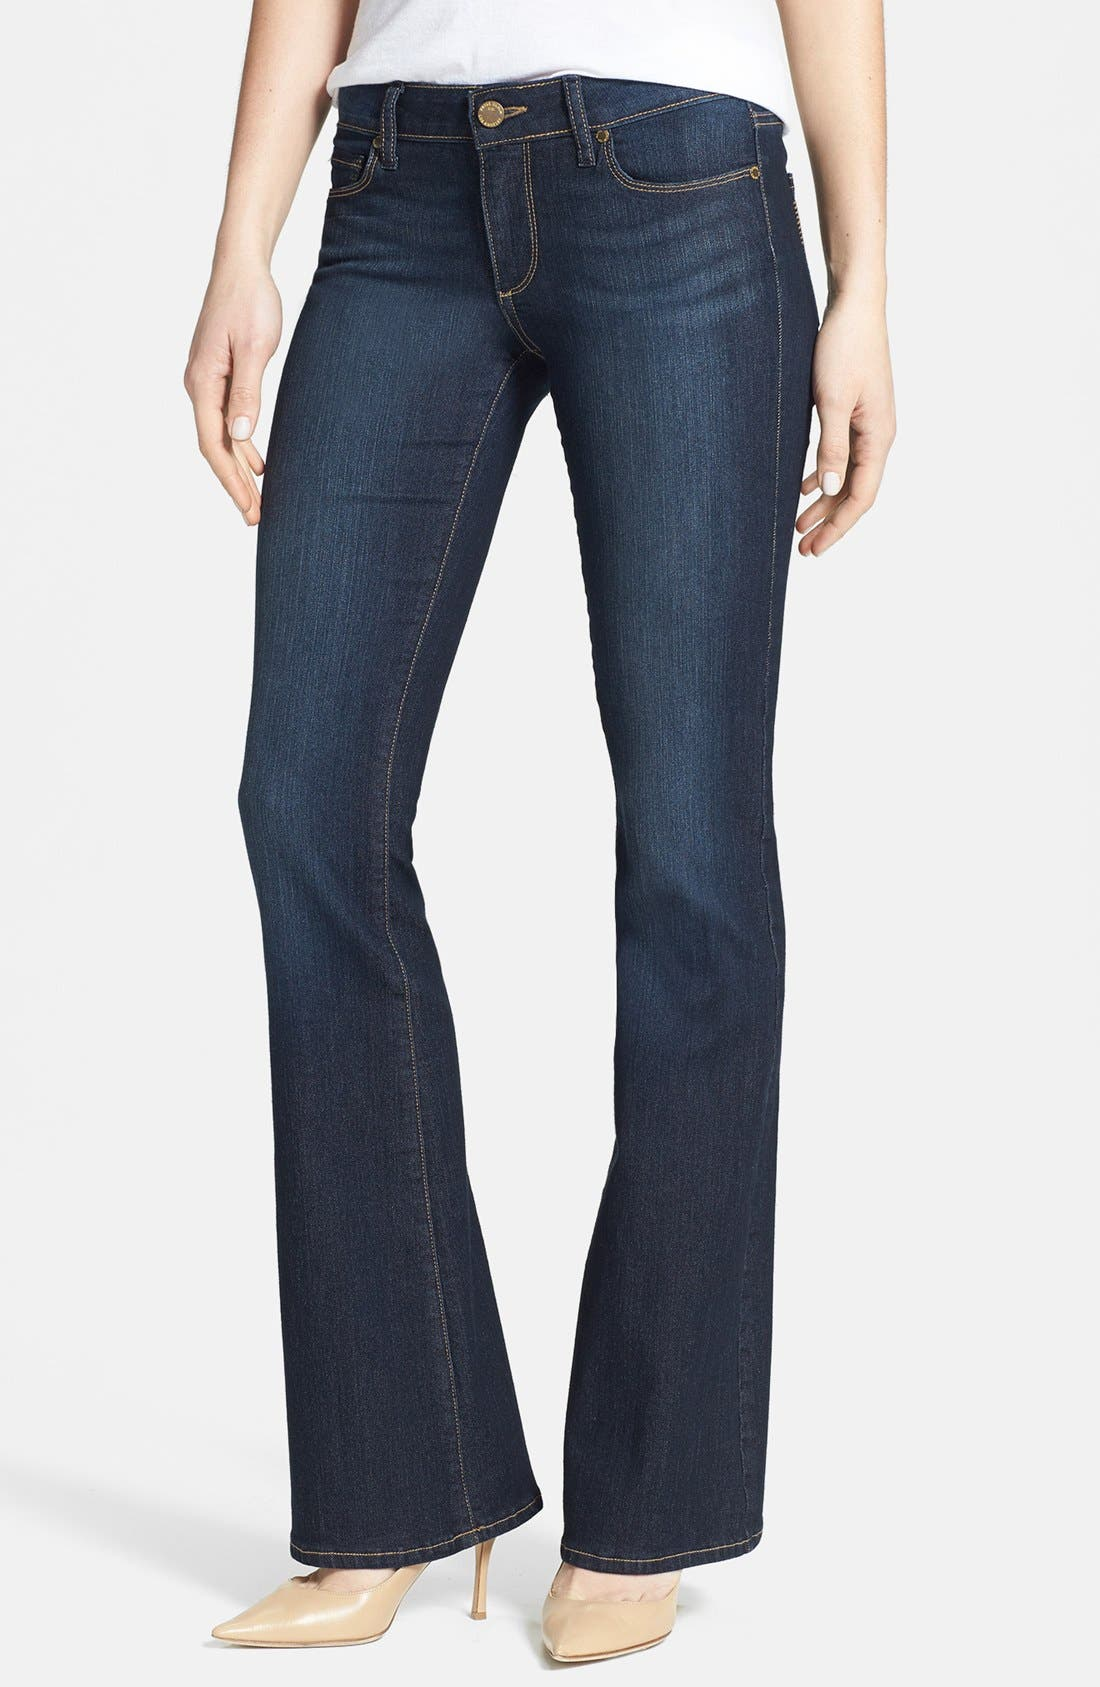 Alternate Image 1 Selected - Paige Denim 'Skyline' Bootcut Jeans (Moonrise)